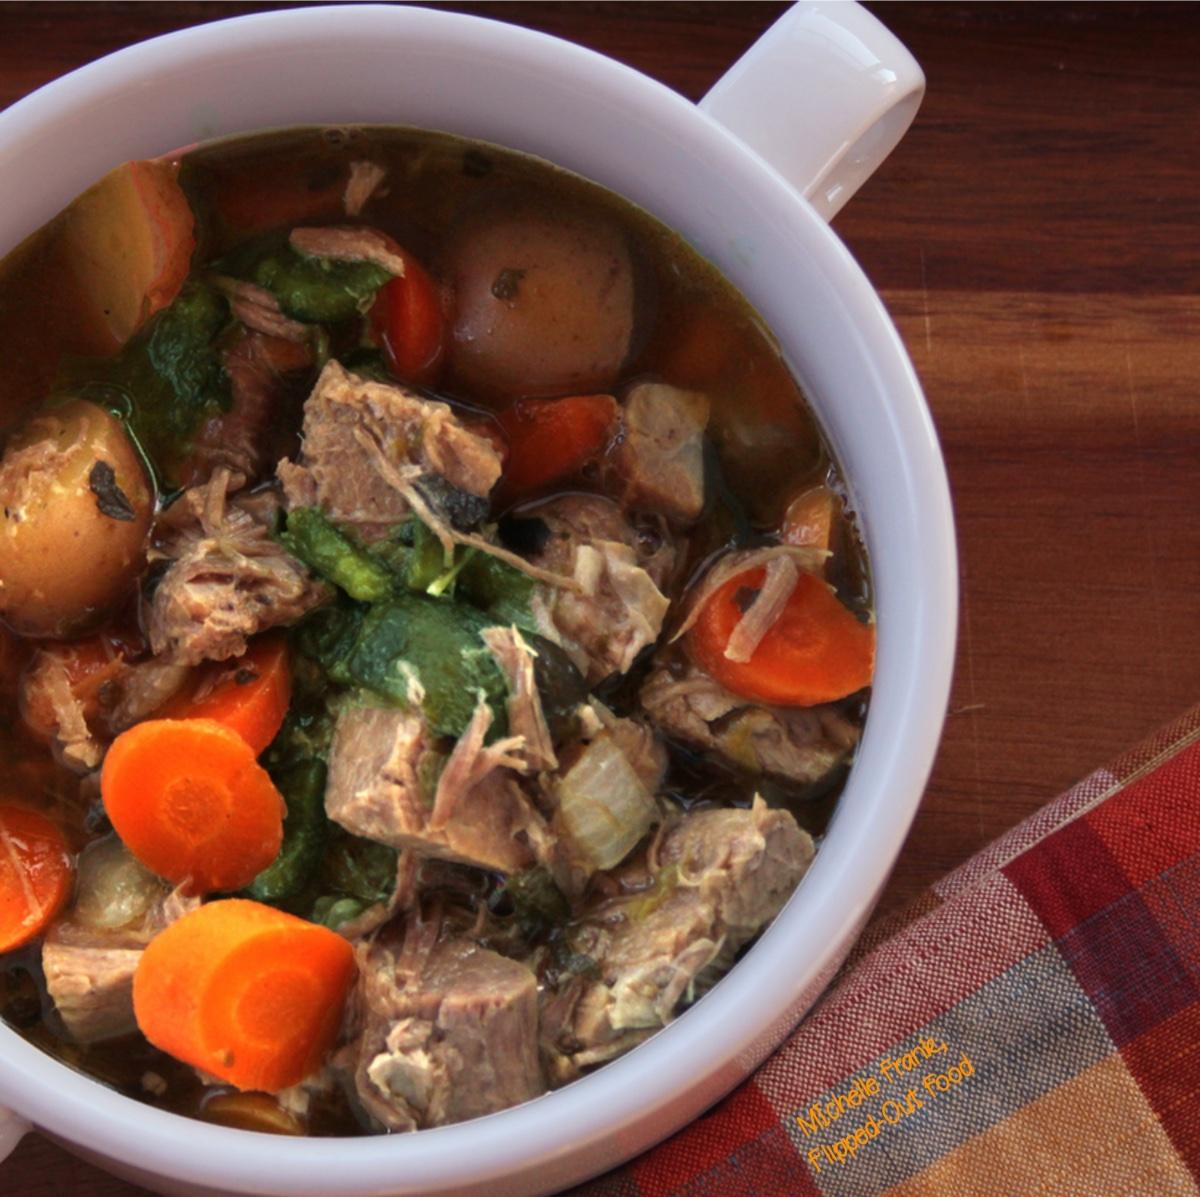 A closeup of Caldillo: Green Chile Pork Stew in a 2-handled bowl.